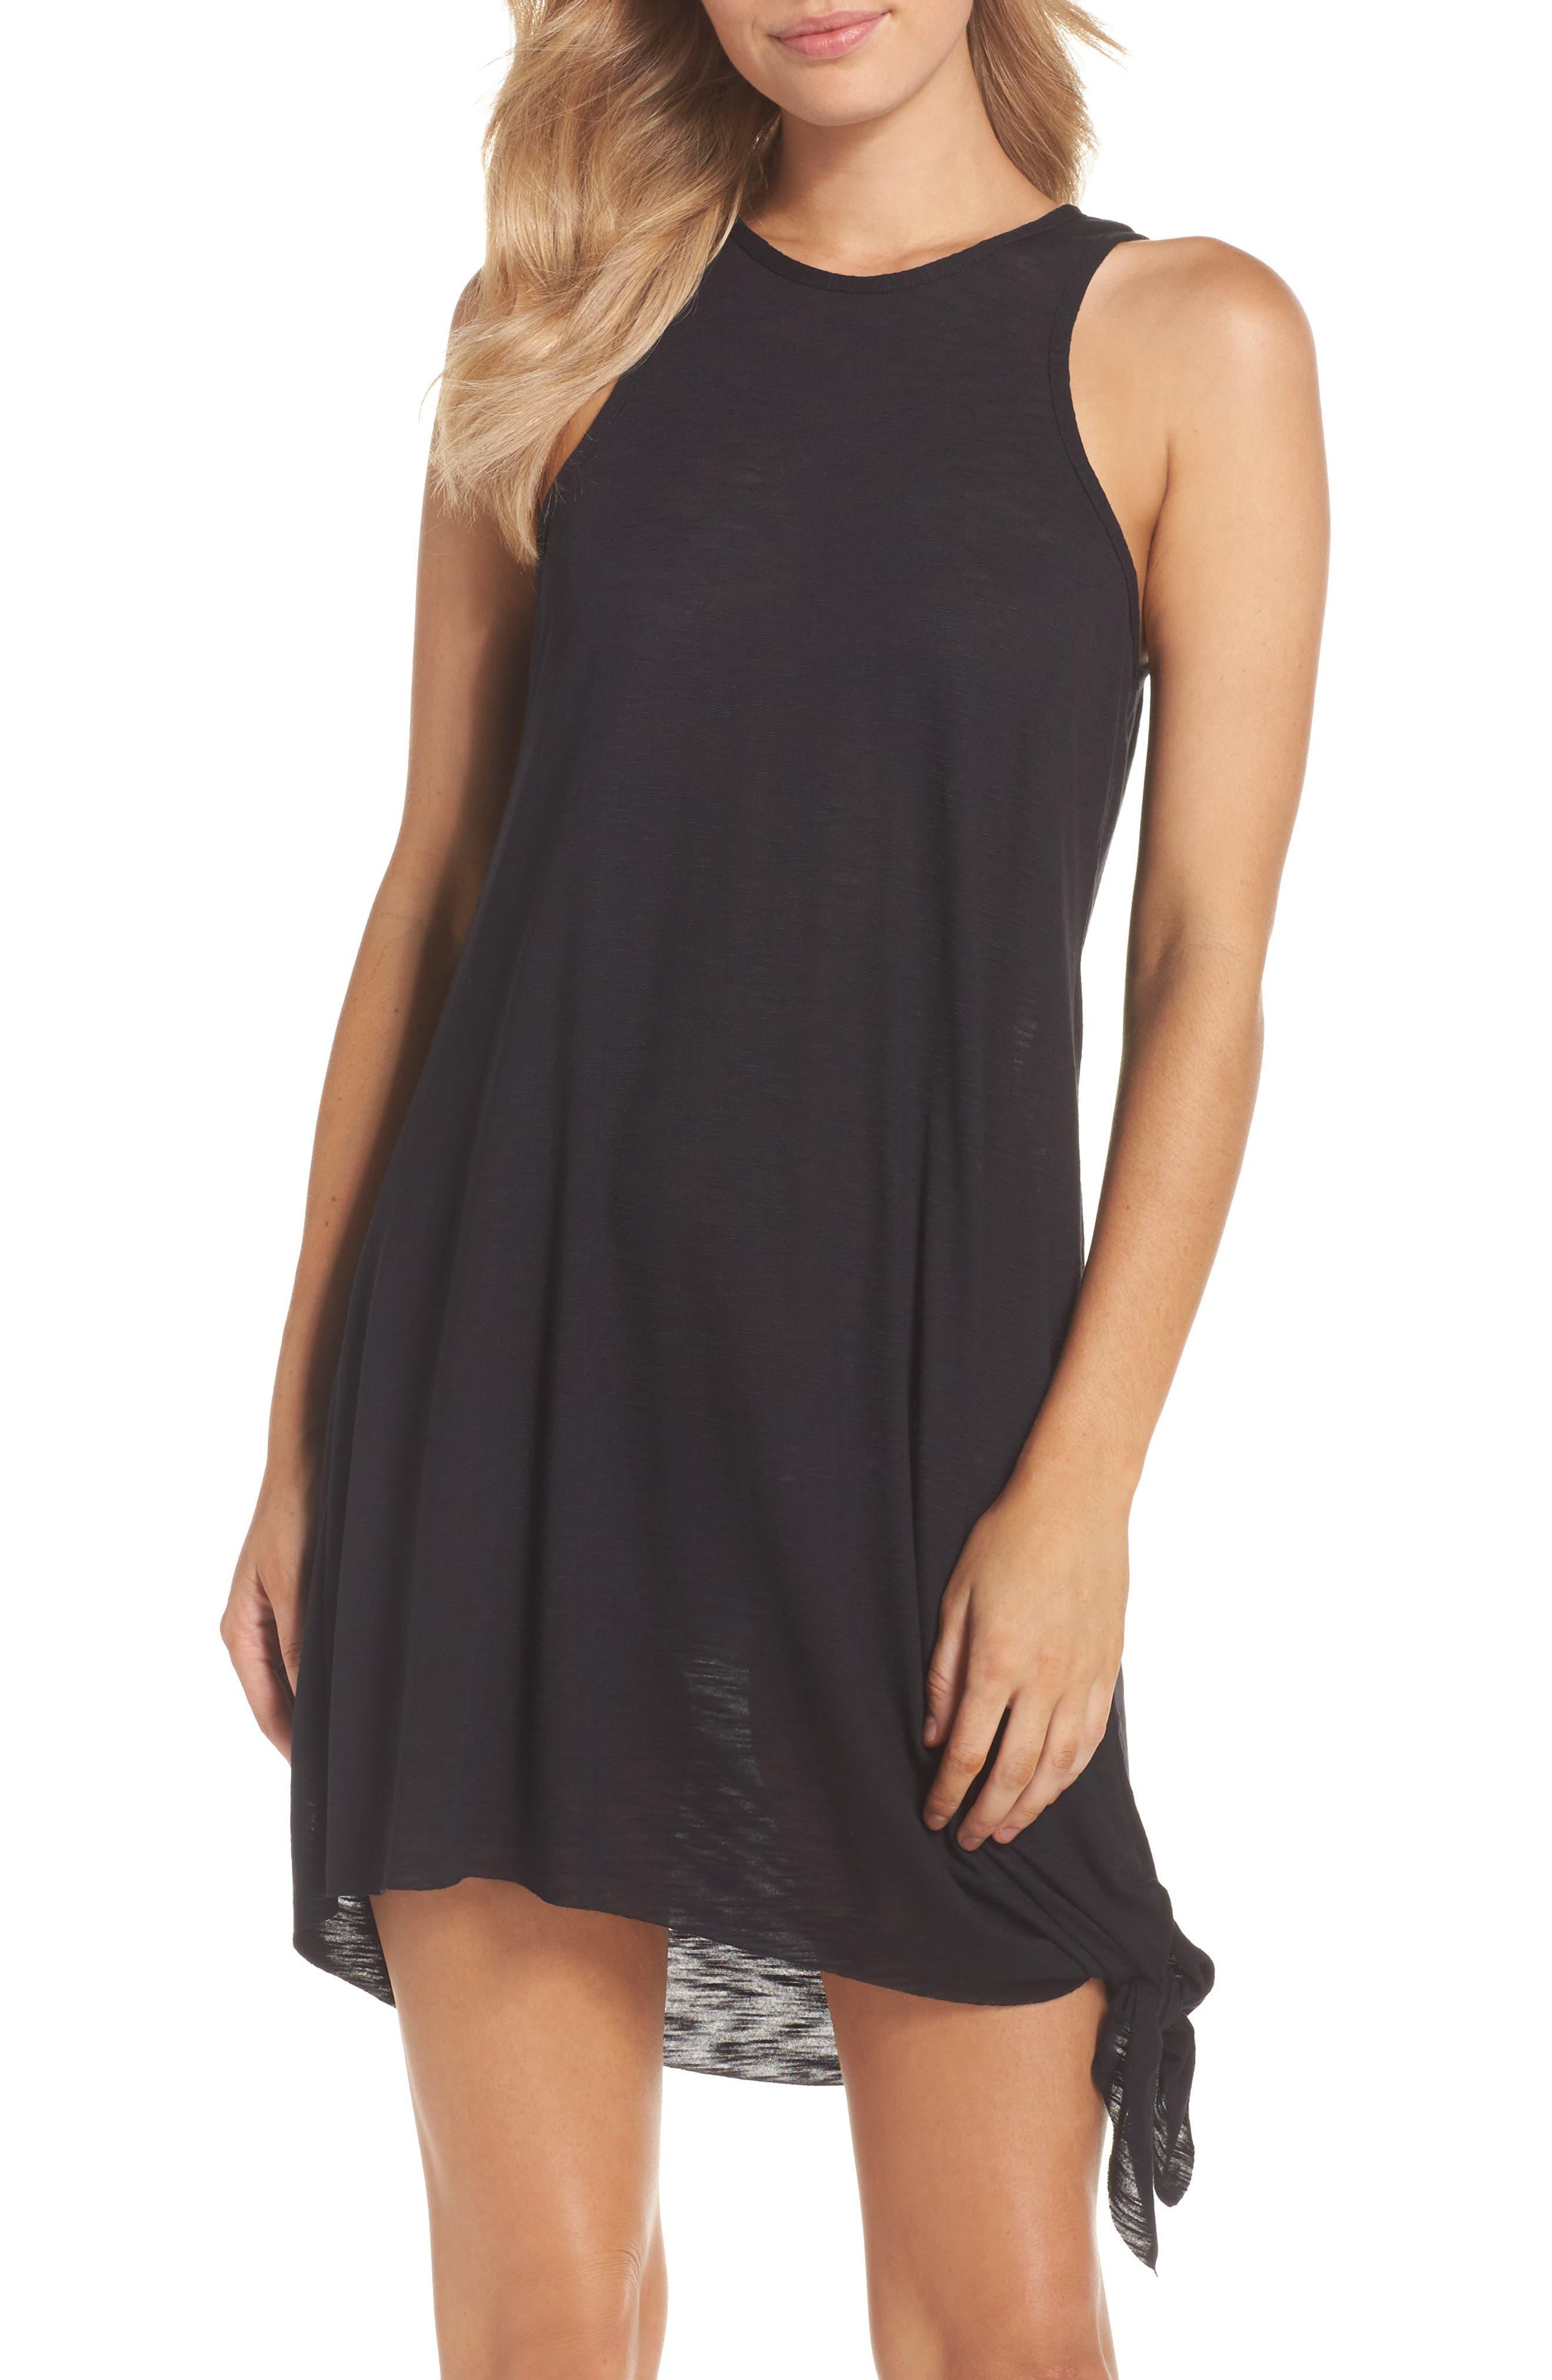 Becca Breezy Basics Cover-Up Dress, Black